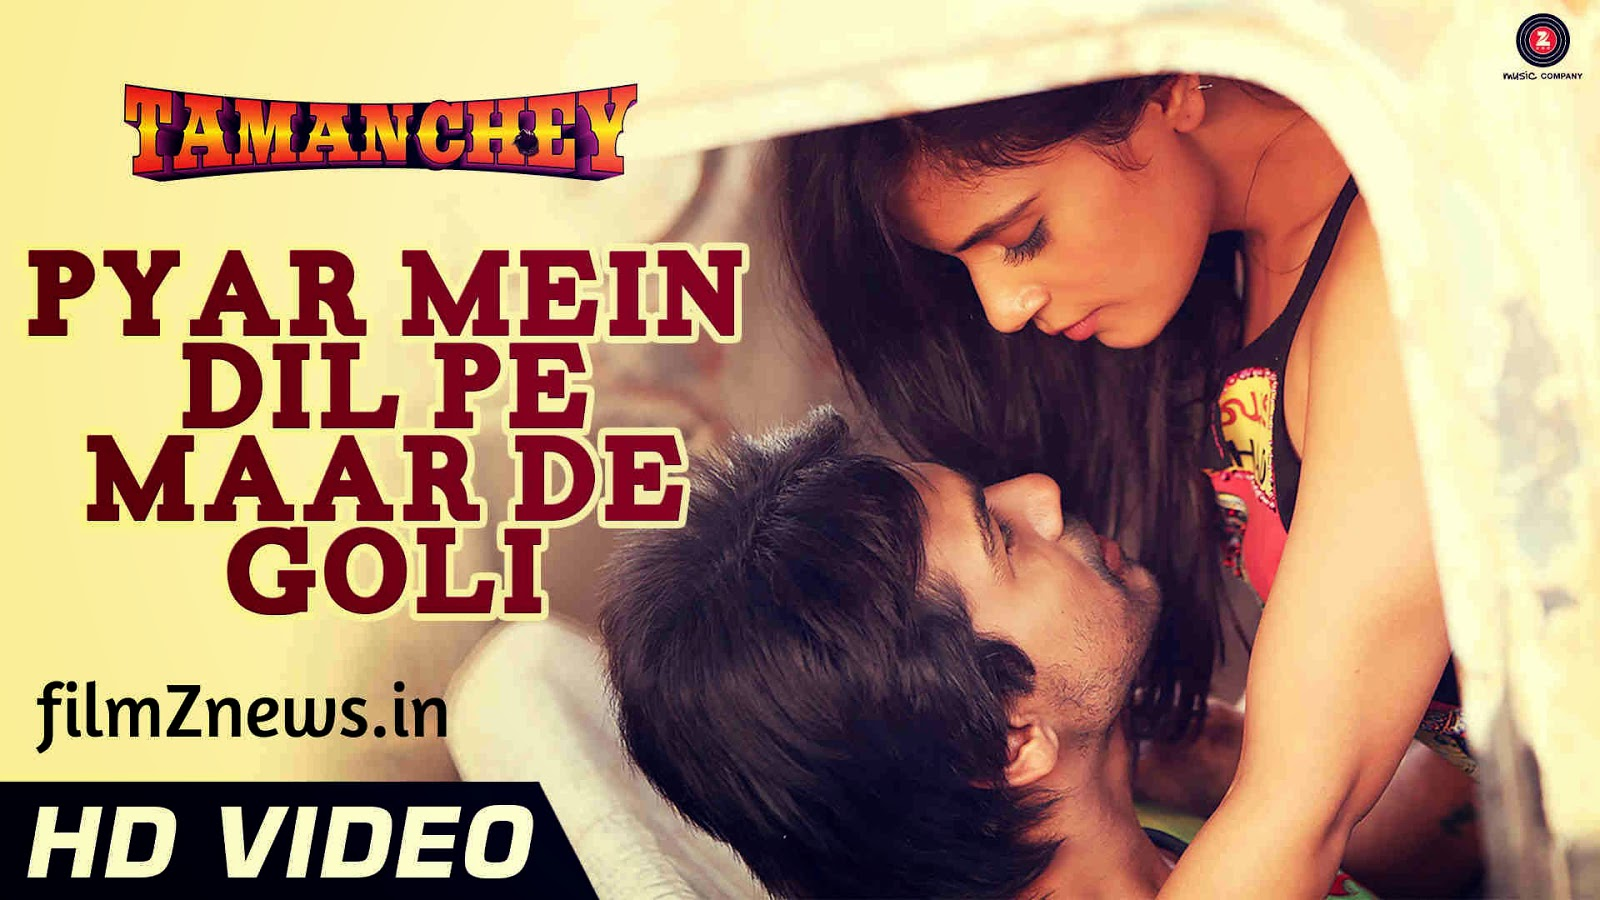 Pyar Mein Dil Pe Maar De Goli Video from Tamanchey (2014) Movie